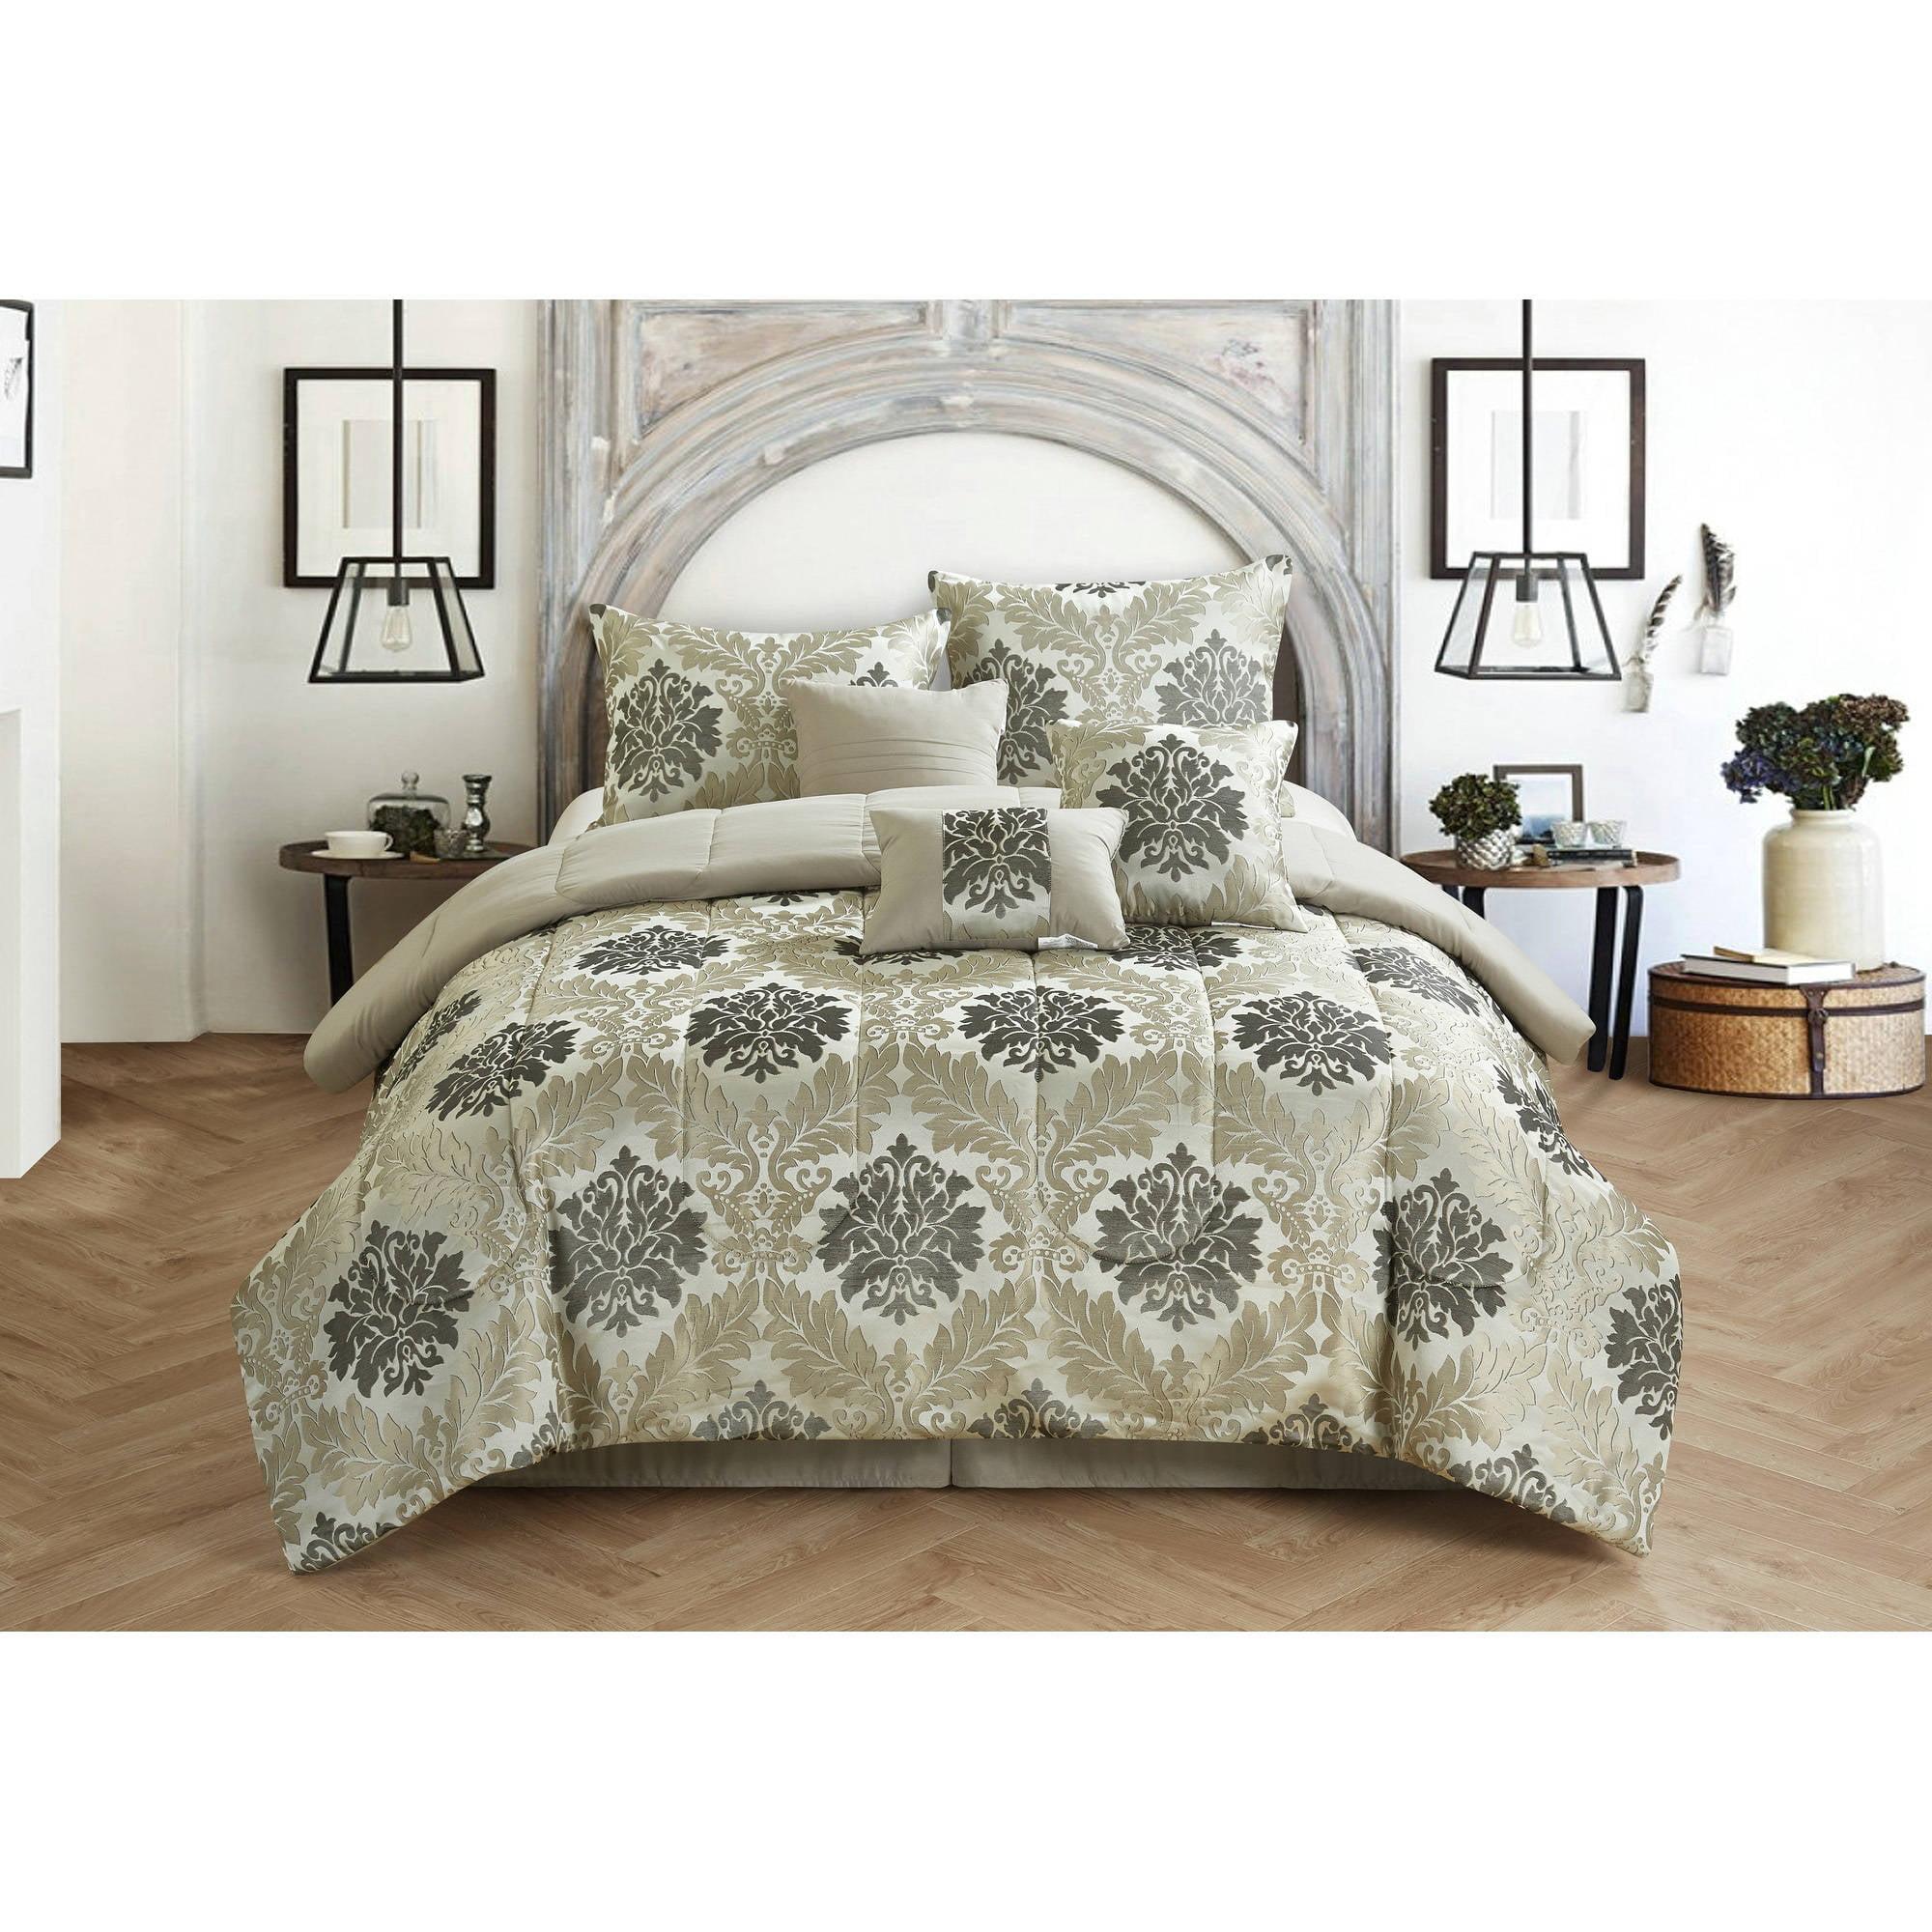 CASA Victoria Jacquard 7-Piece Bedding Comforter Set by Idea Nuova